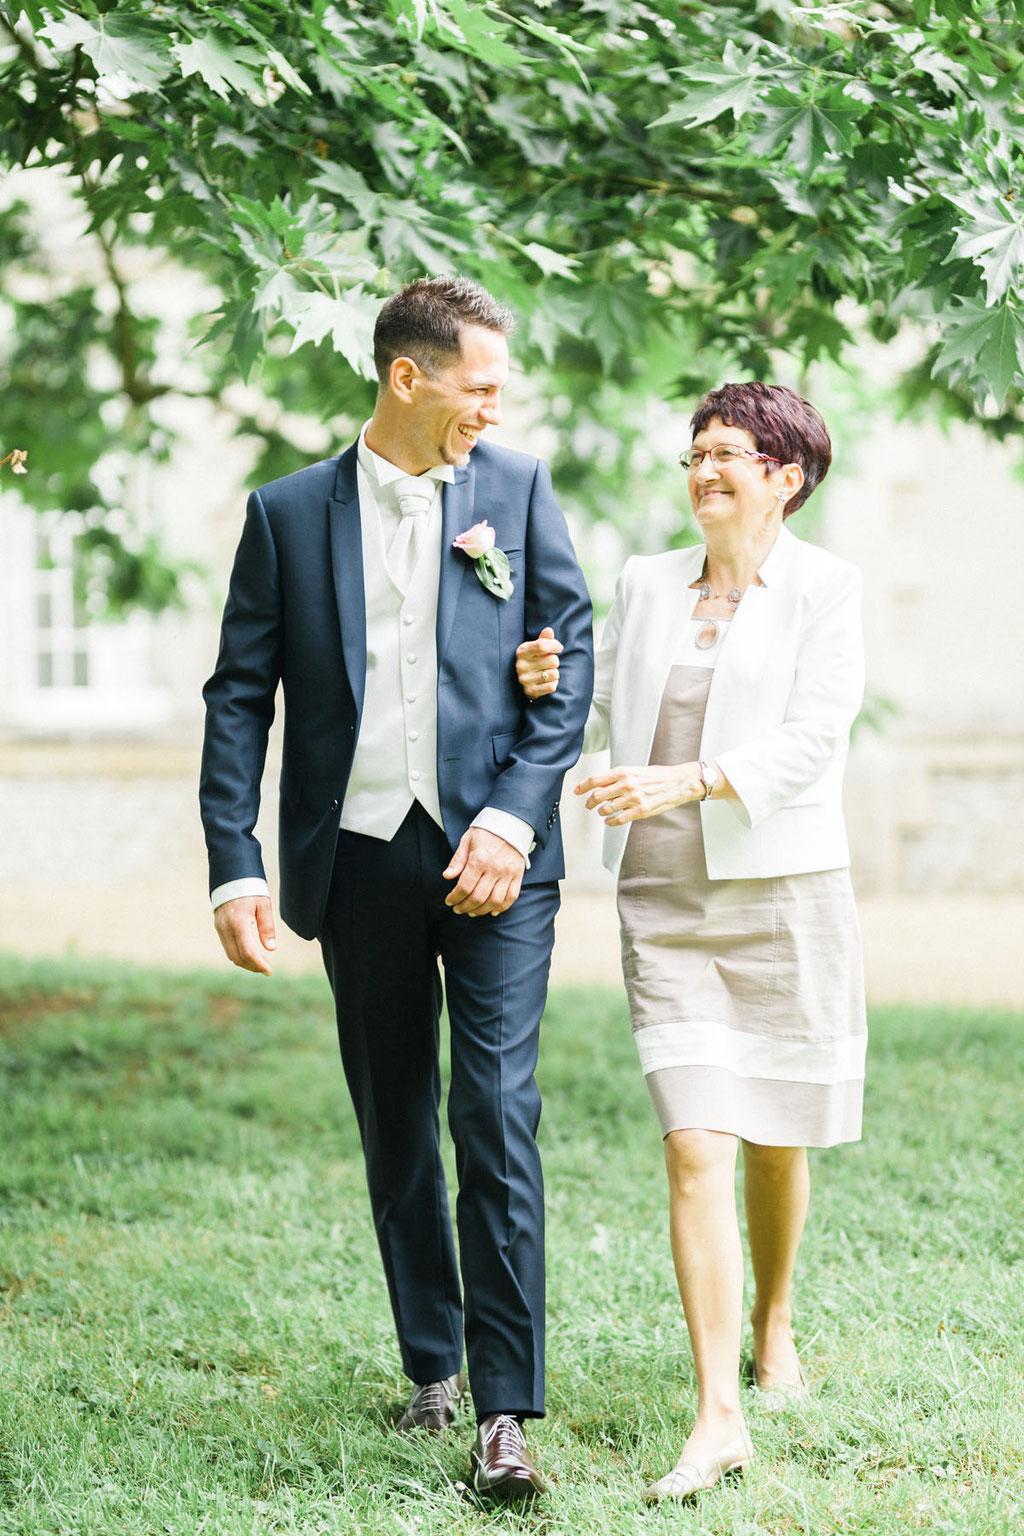 mariage  château cop-choux  mouzeil photographe orlane boisard vendée